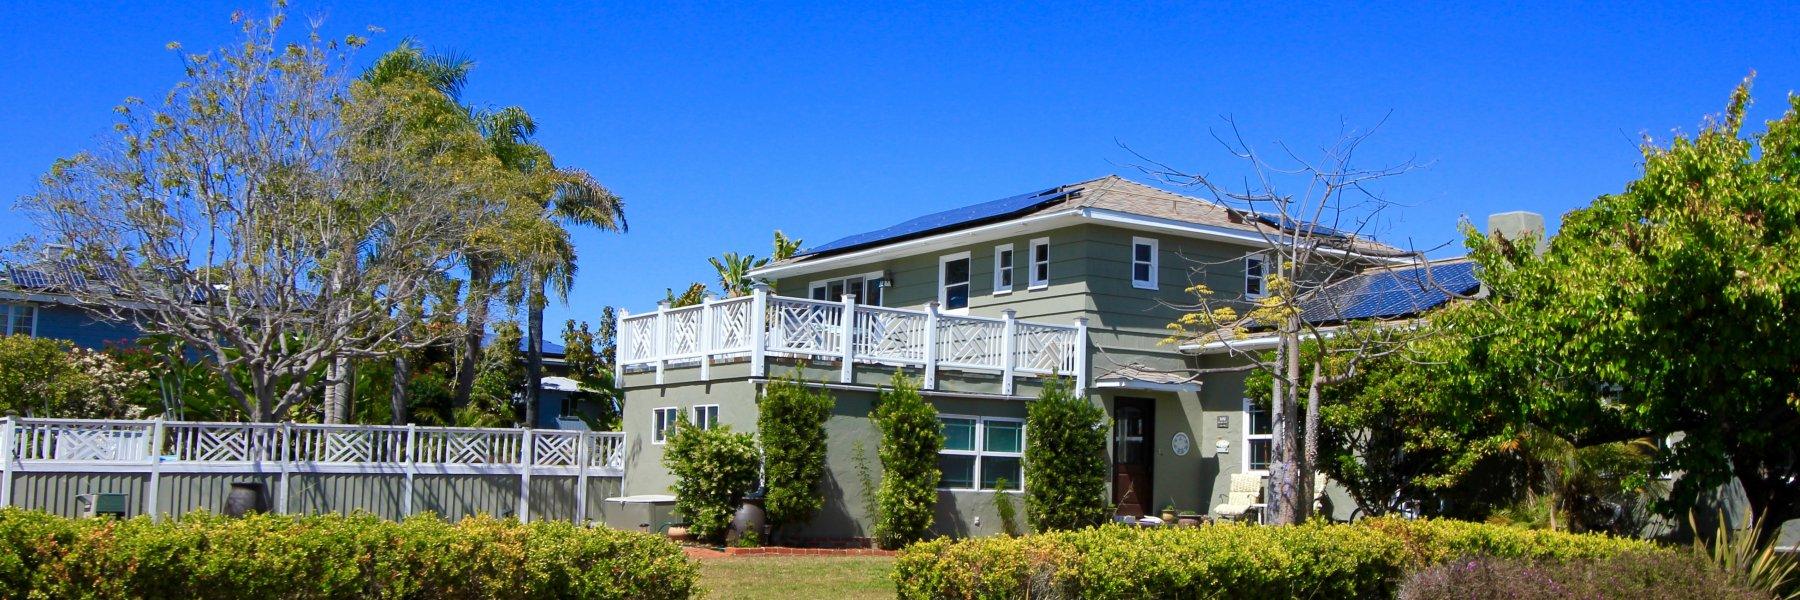 Olde Carlsbad is a community of homes in Carlsbad California